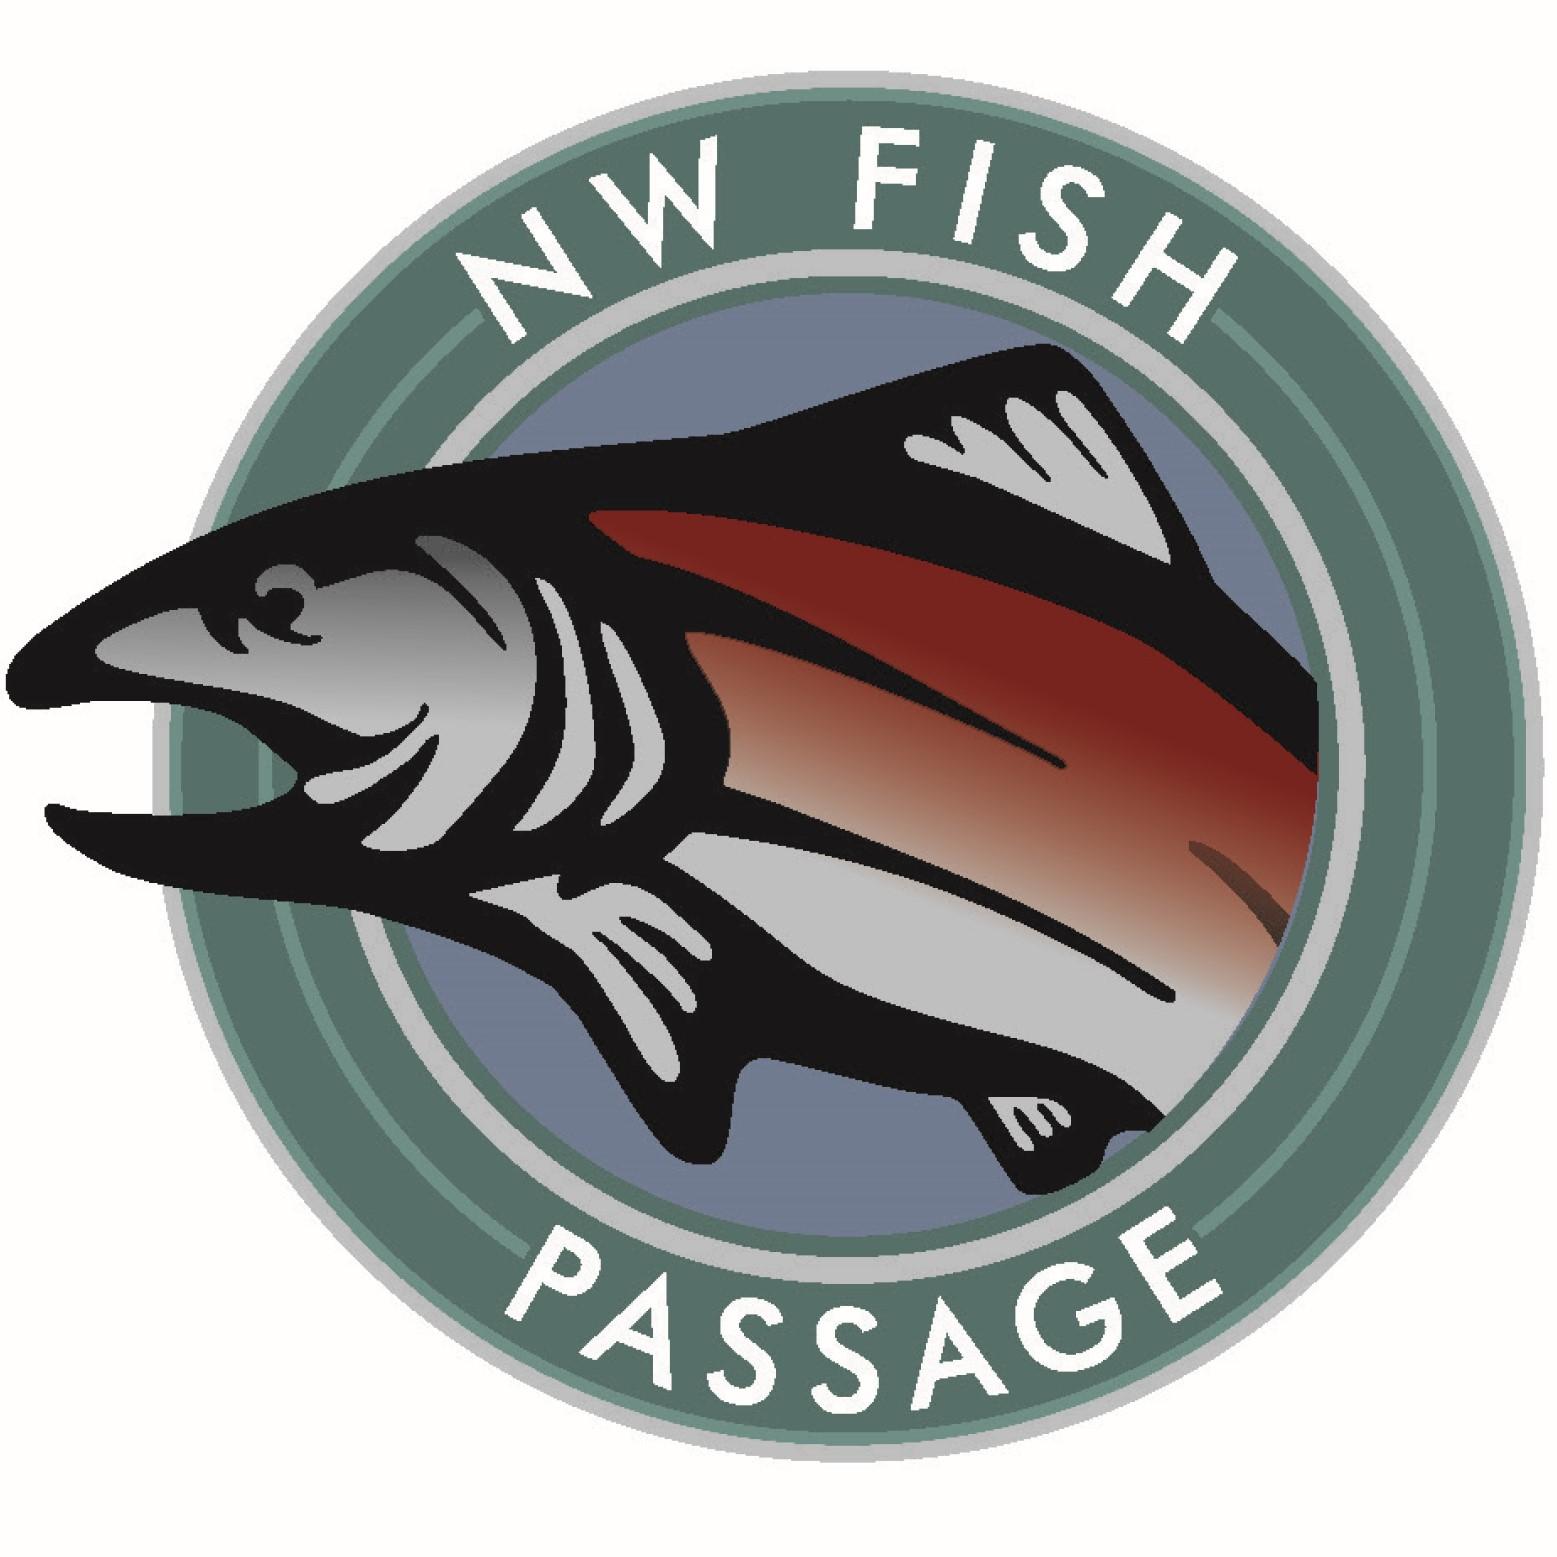 NW Fish Passage show art